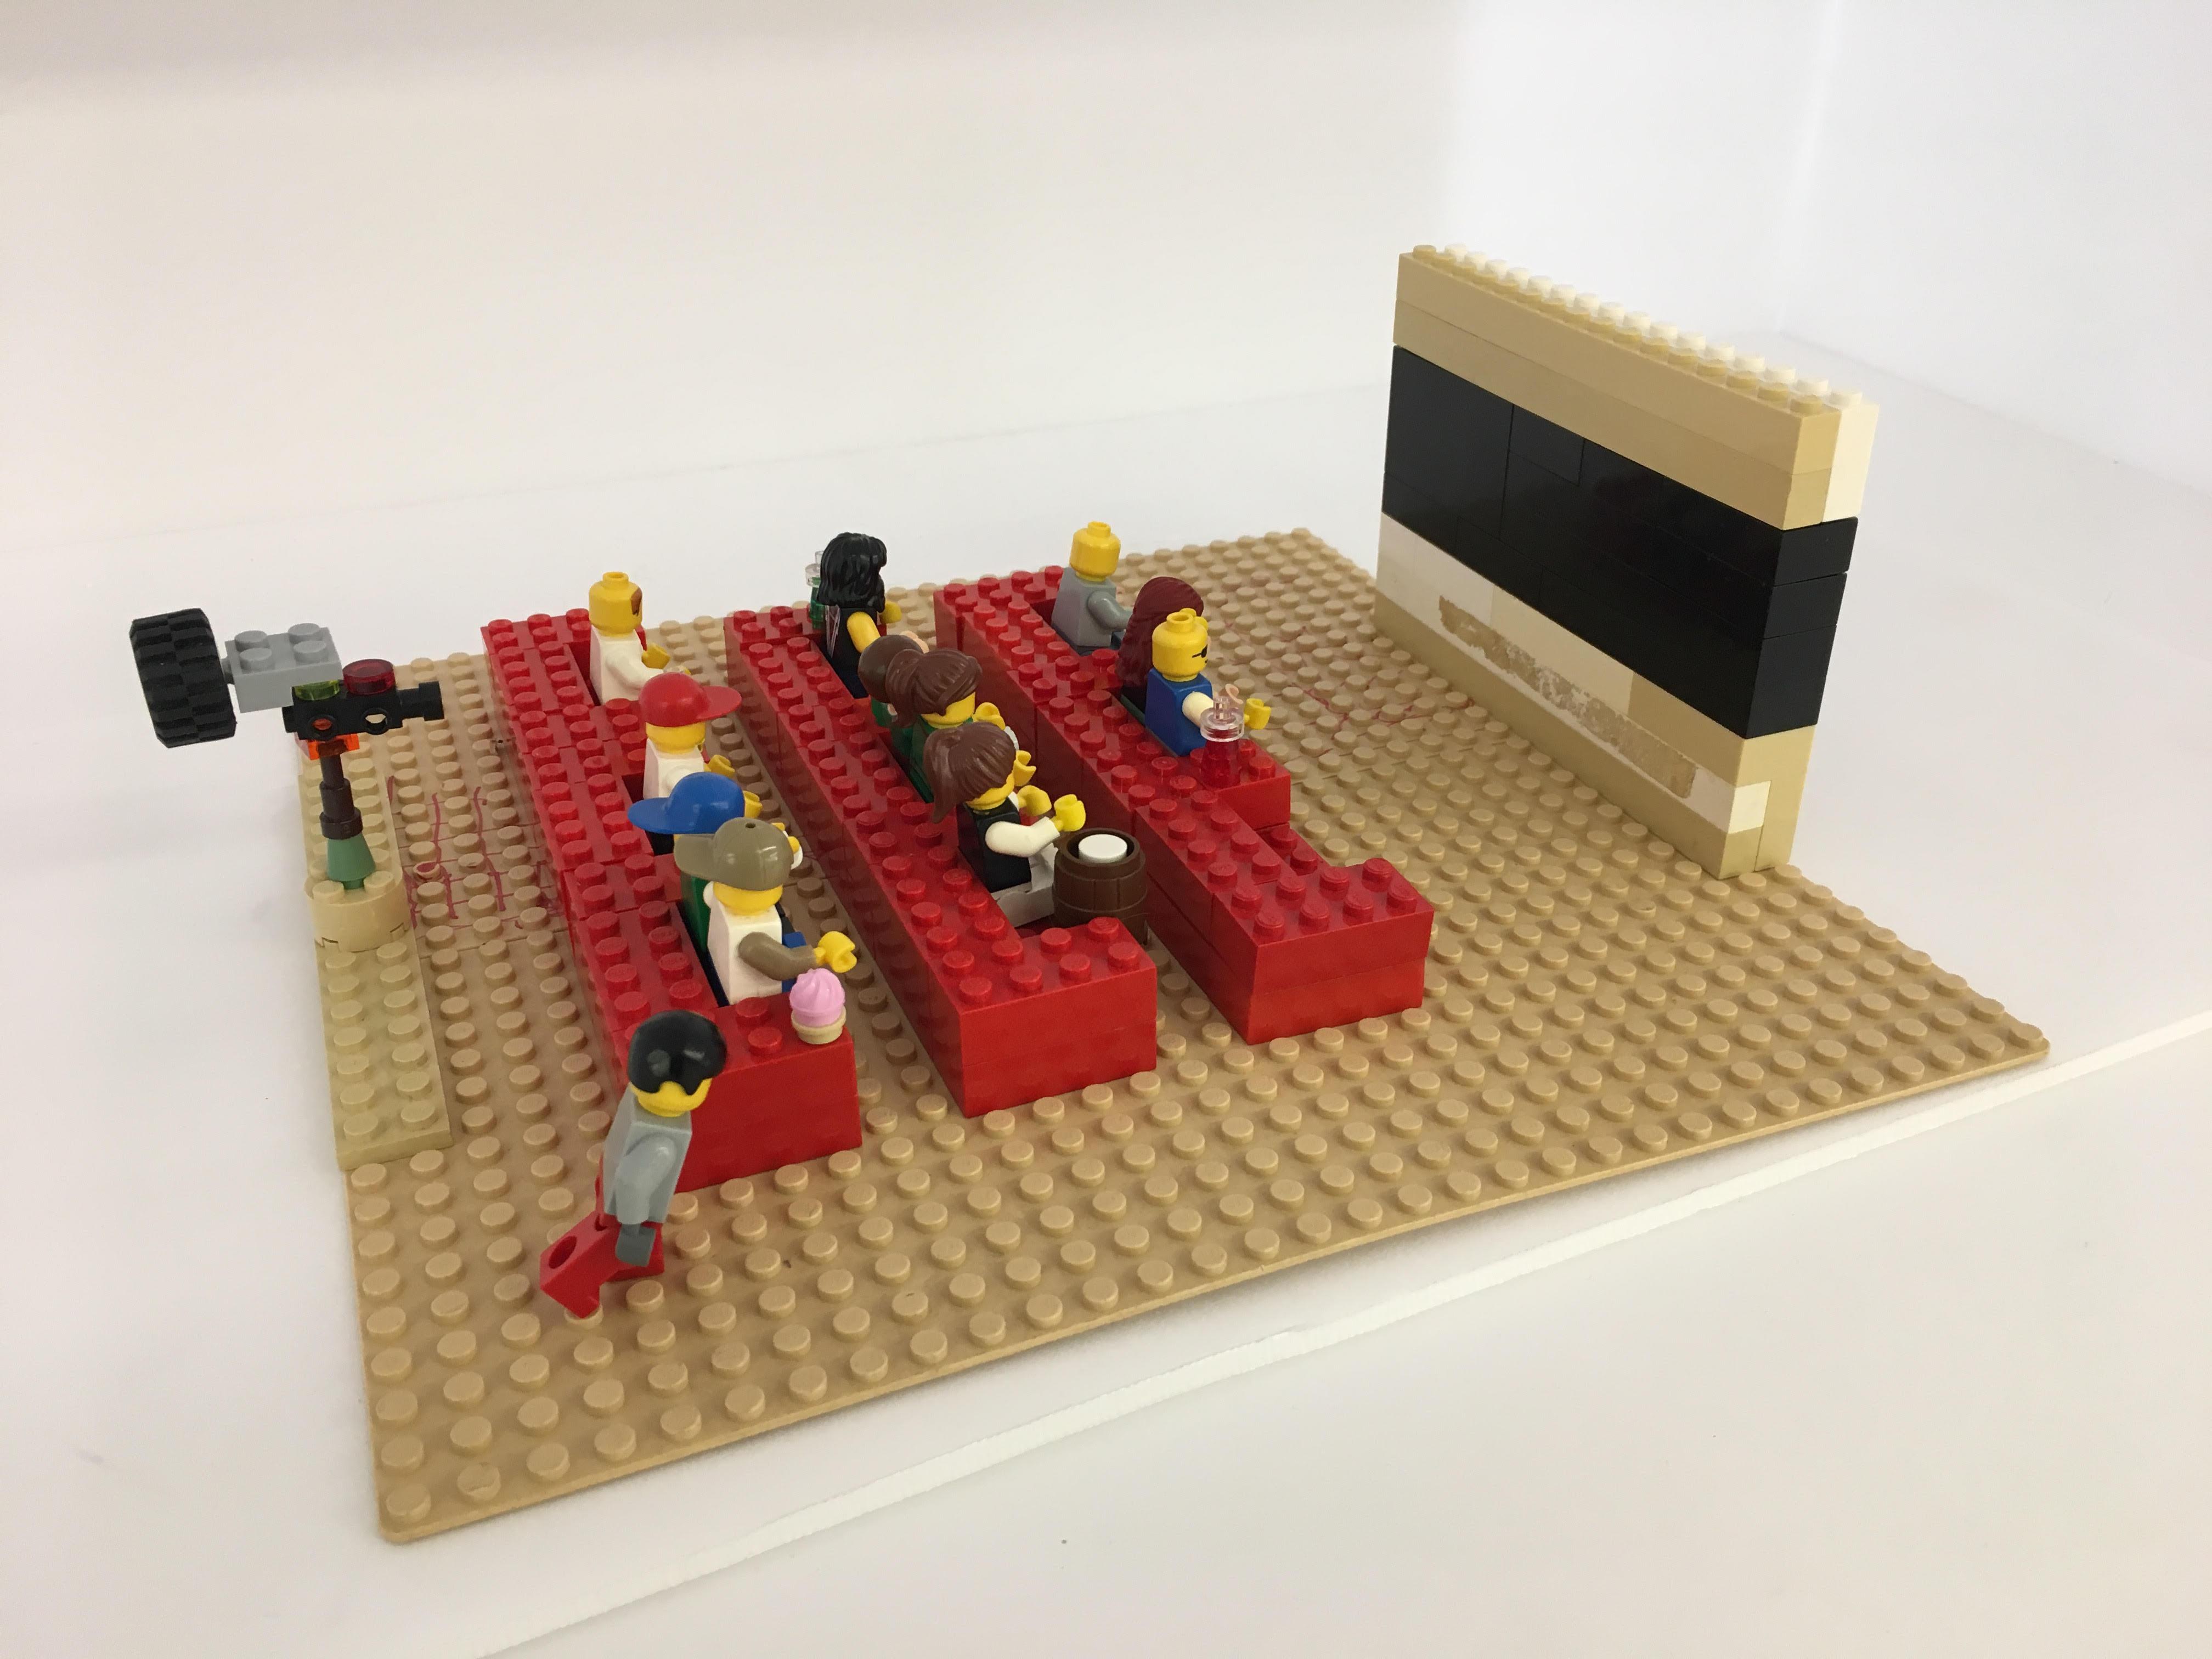 2019 Lego Building Contest